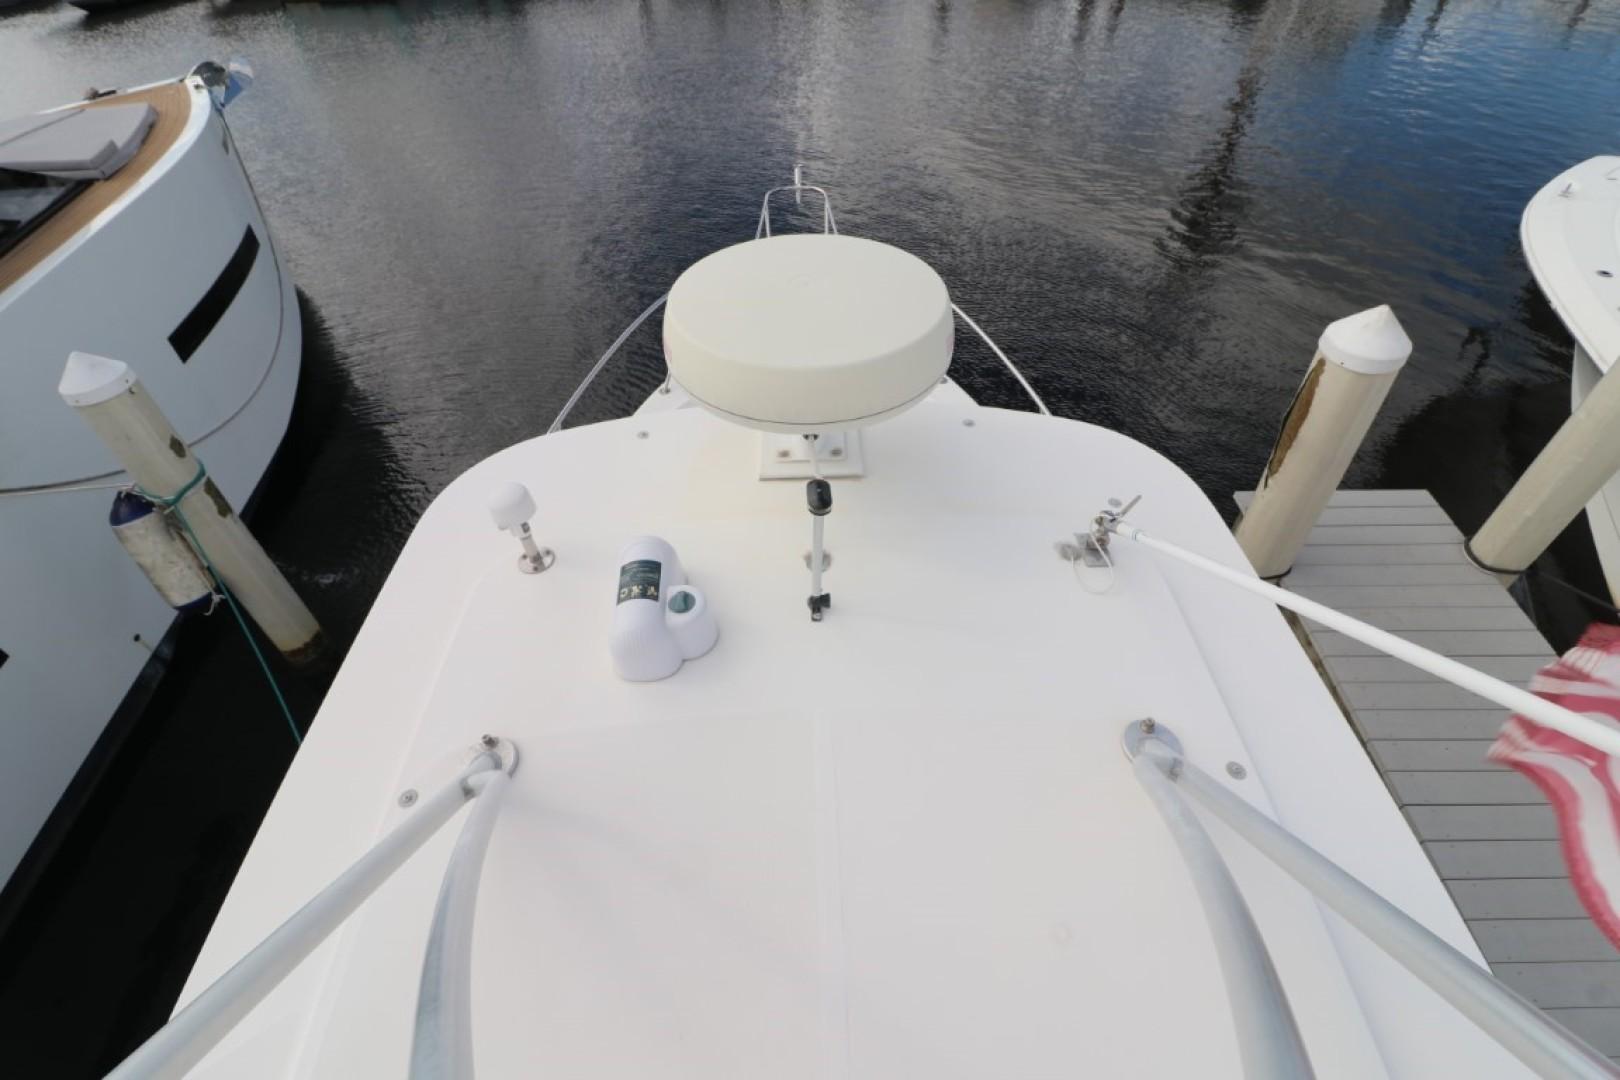 Boston Whaler-280 Outrage 2001 -Fort Lauderdale-Florida-United States-1566093 | Thumbnail